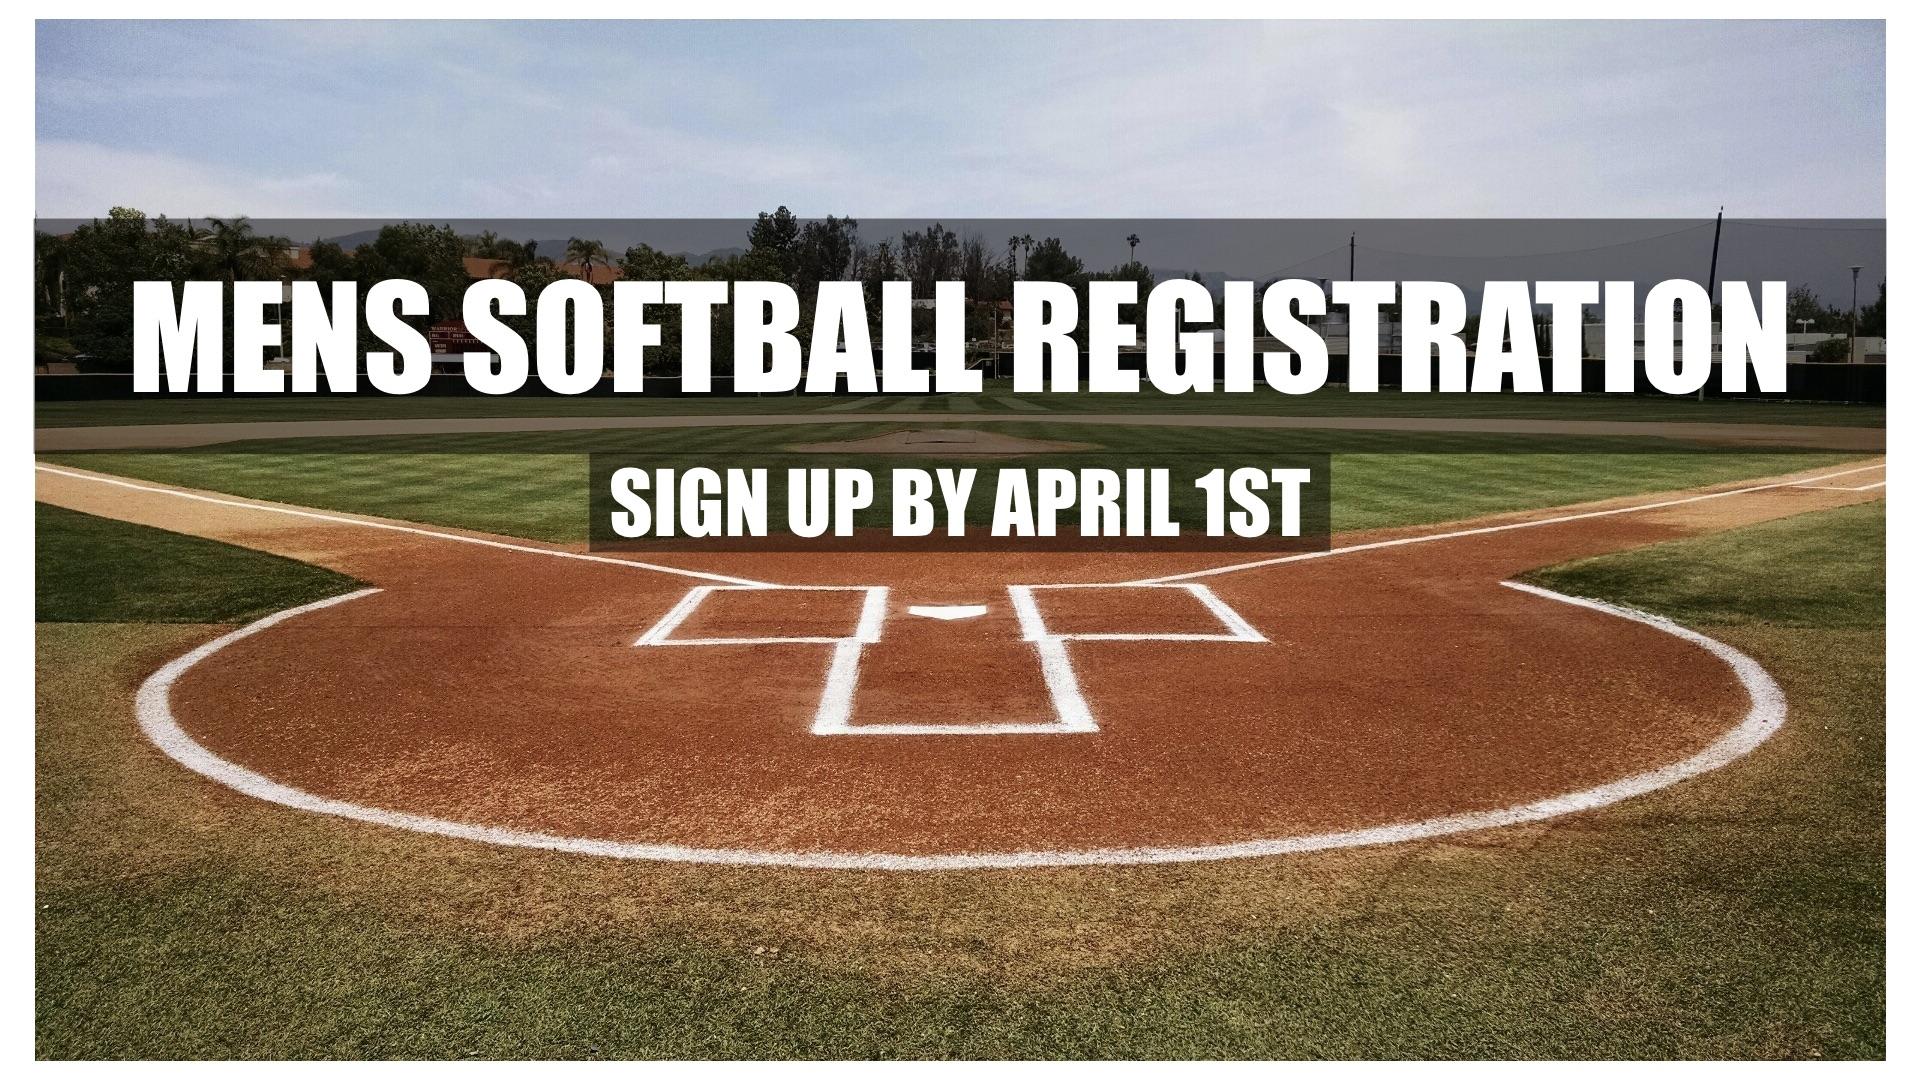 Mens softball registration jpeg